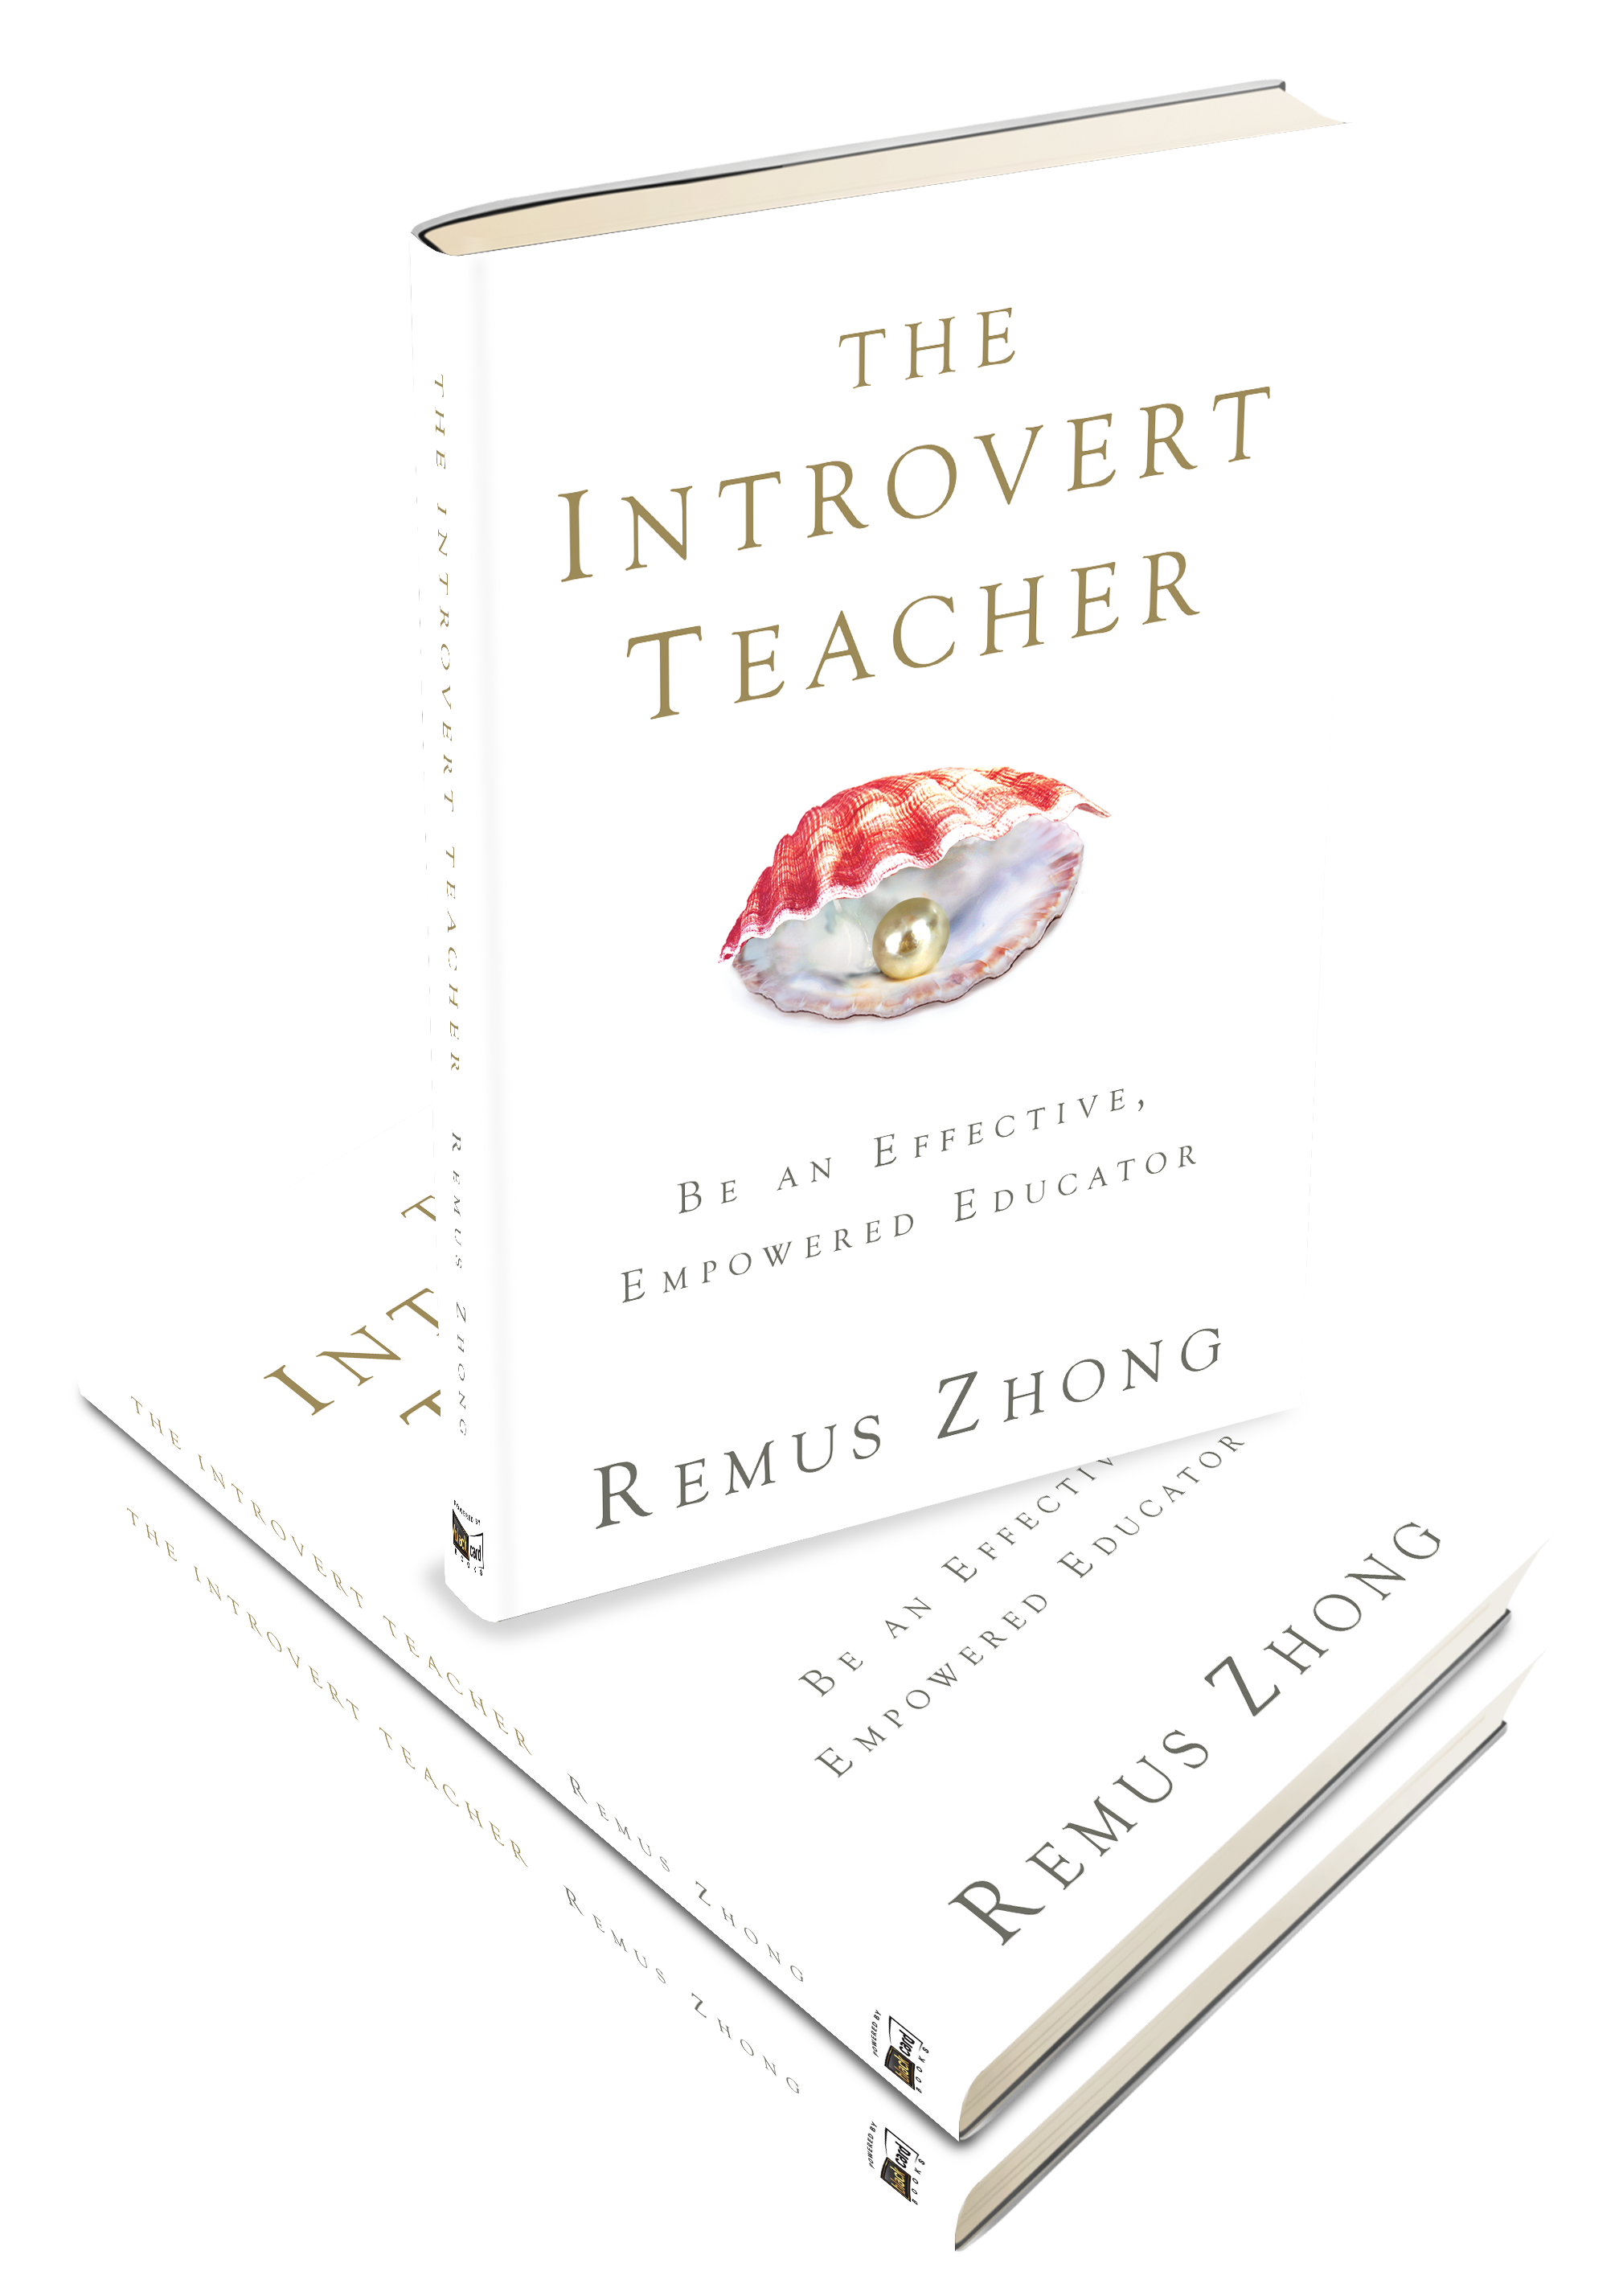 The Introvert Teacher Stack